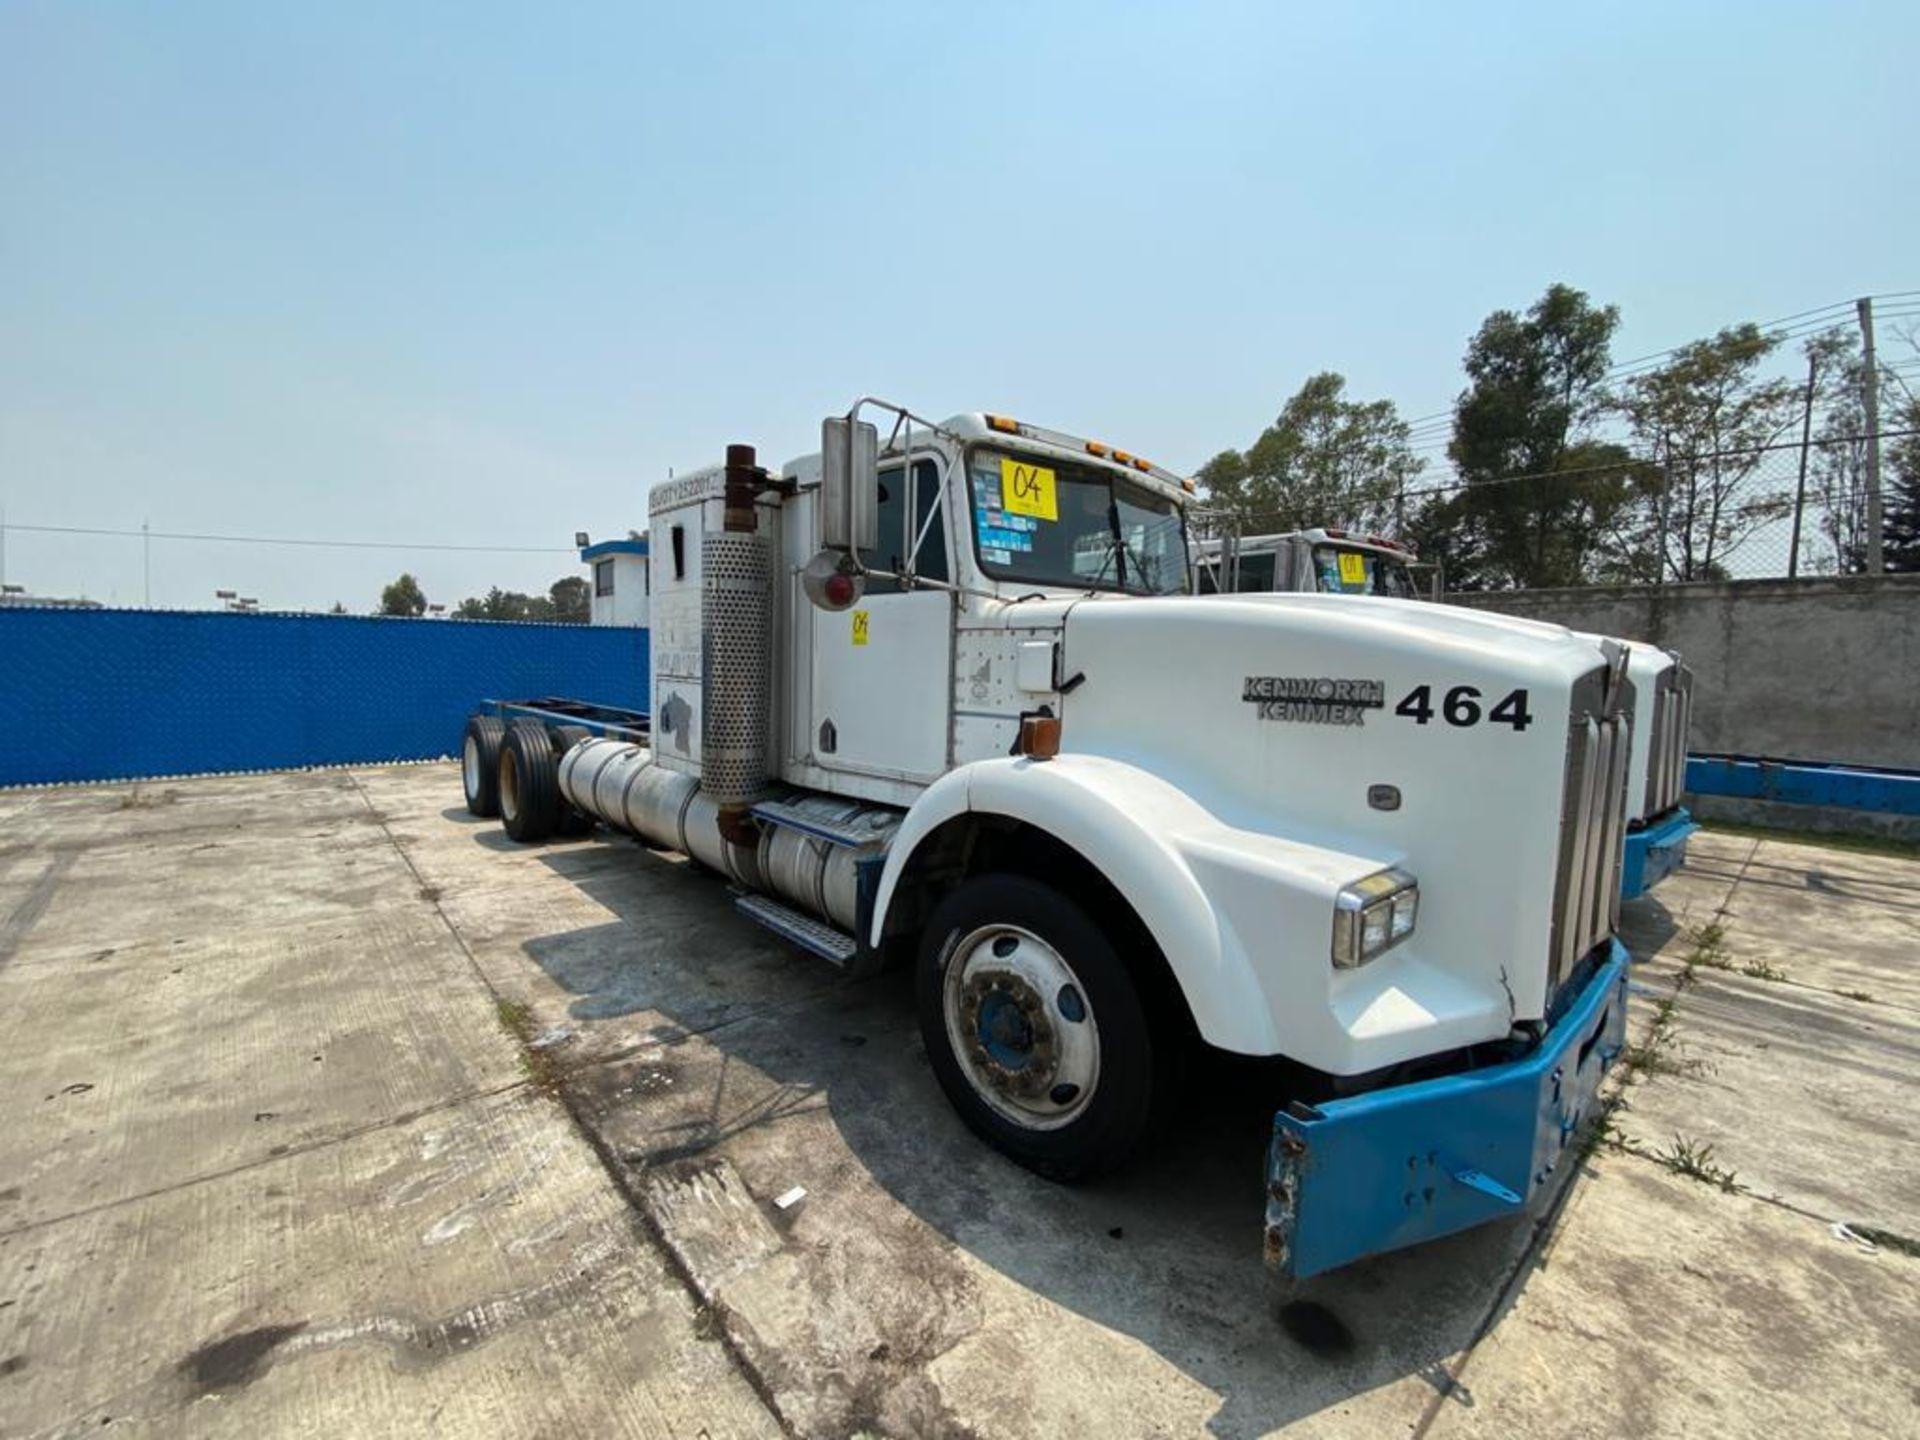 1999 Kenworth Sleeper truck tractor, standard transmission of 18 speeds - Image 2 of 70